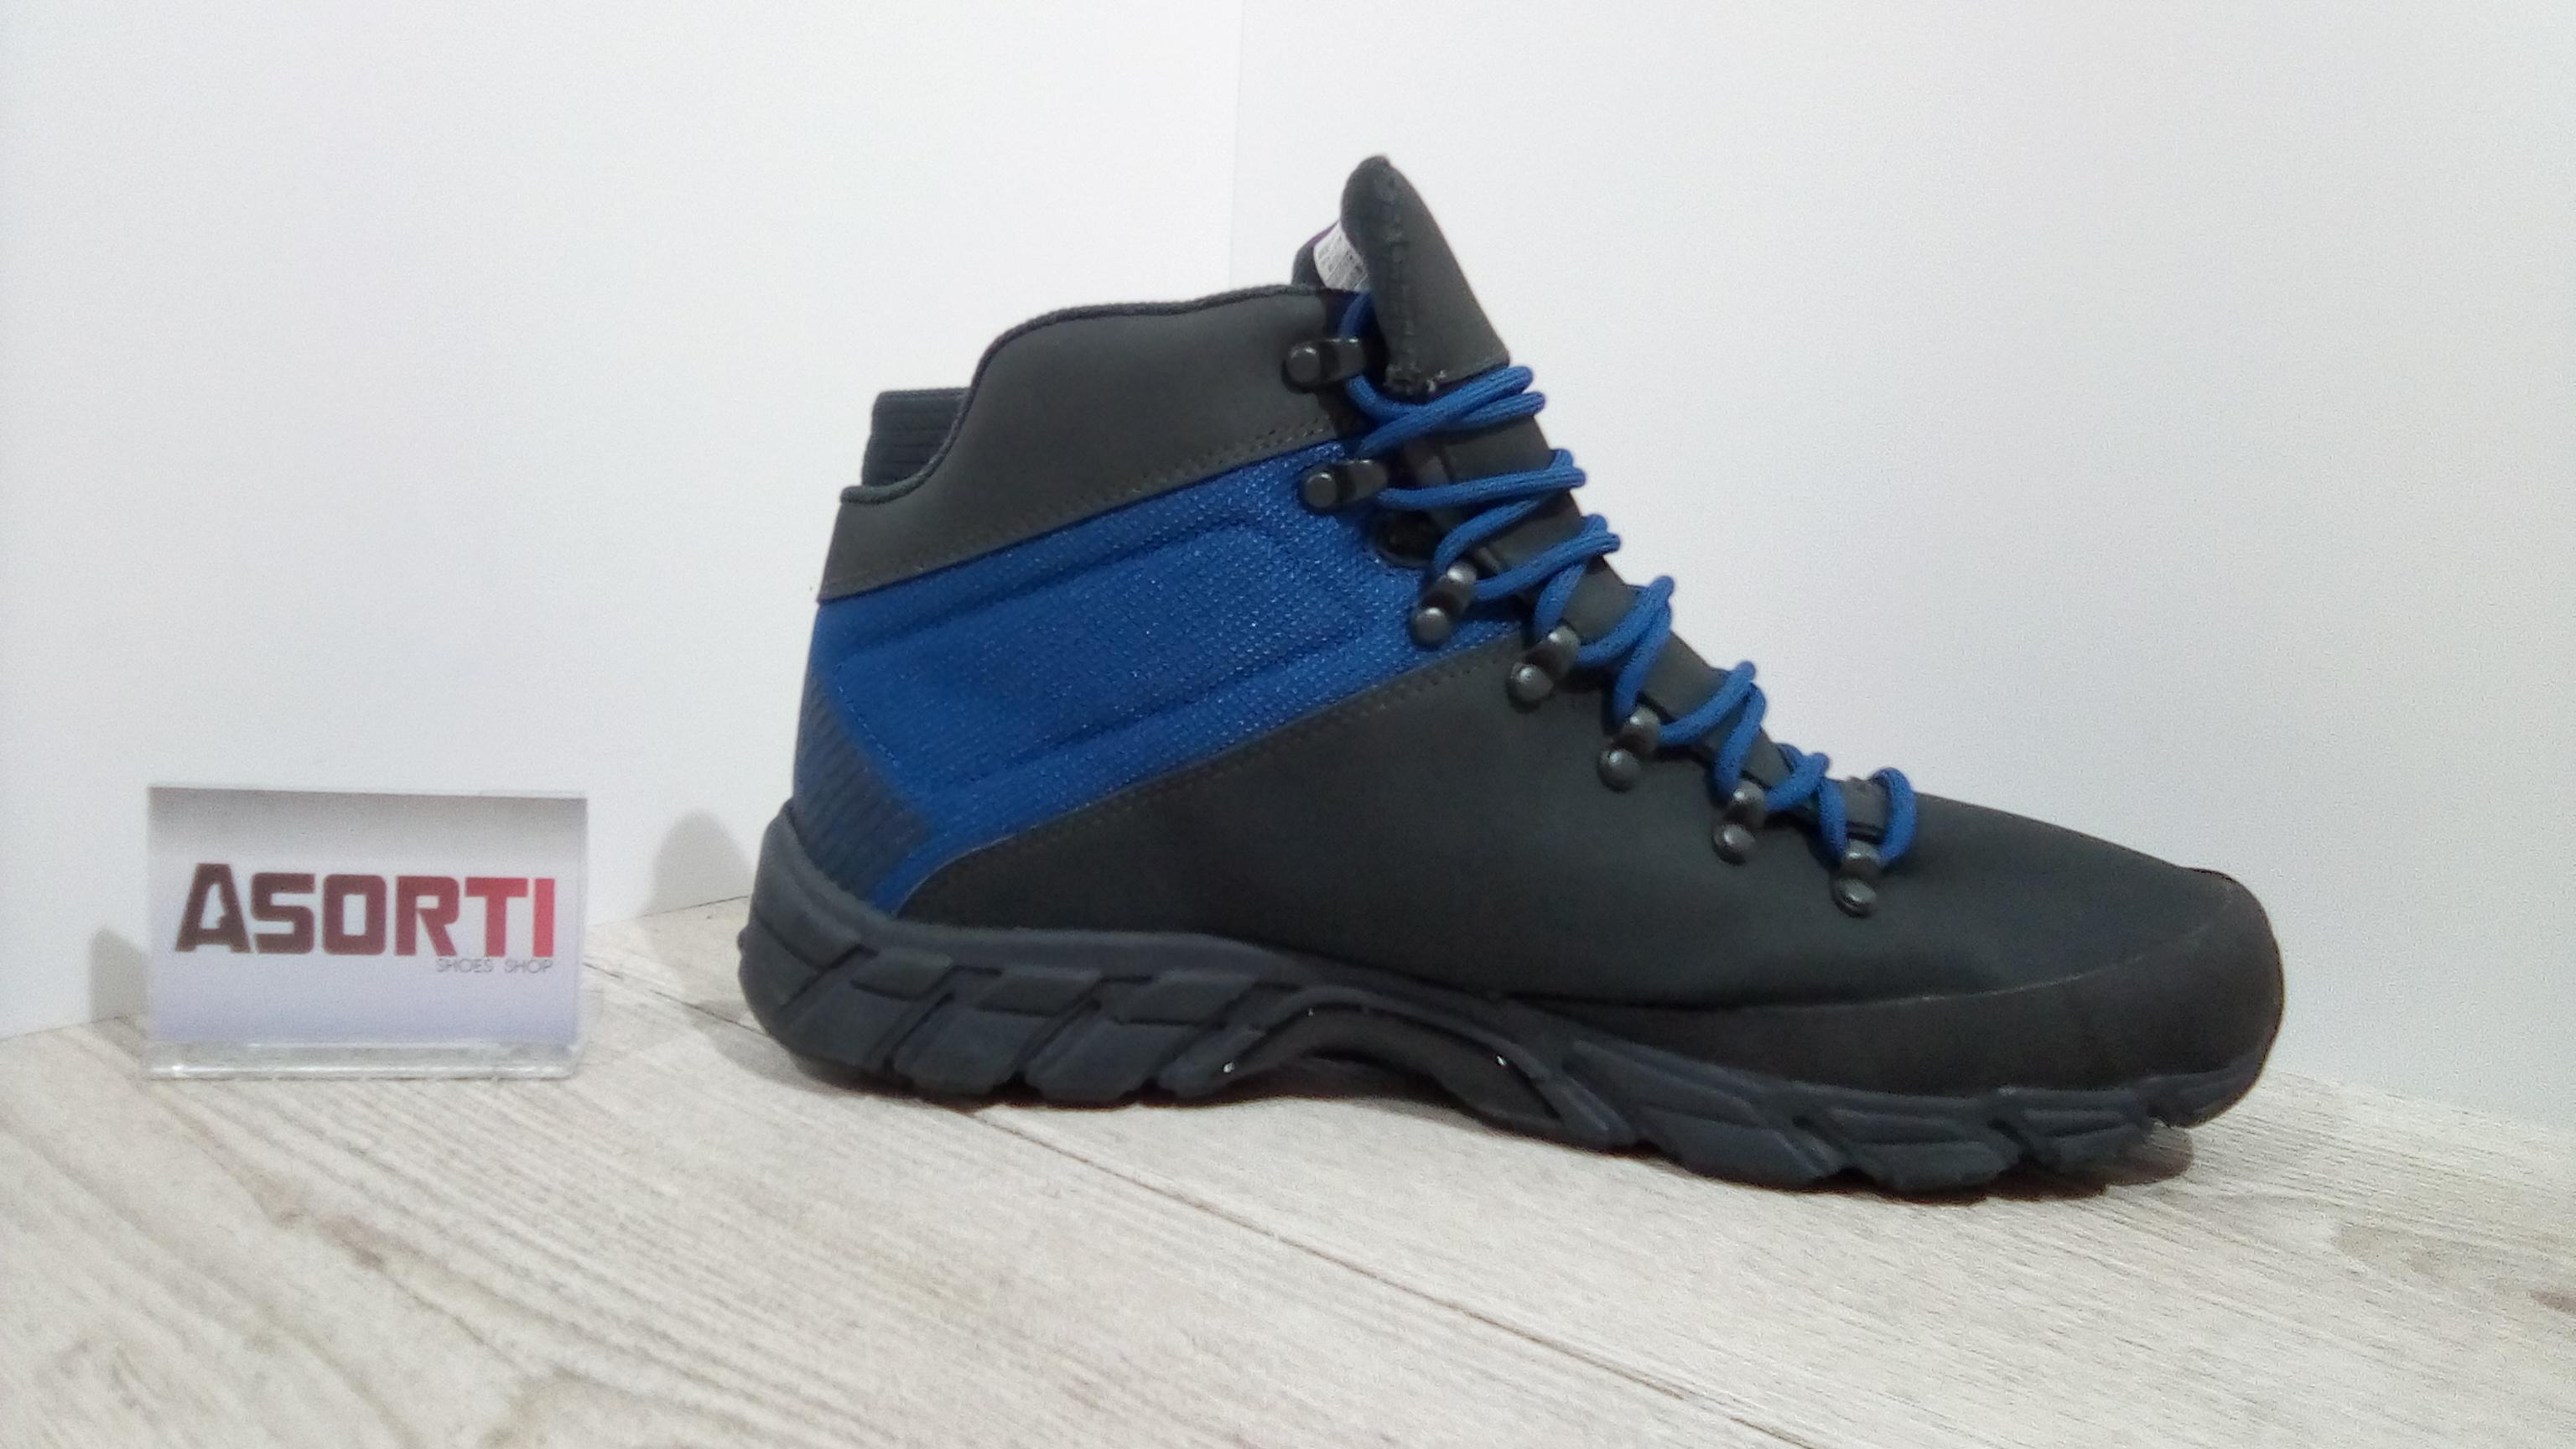 9f5d3e97 ... Мужские утепленные кроссовки Reebok Trailchaser MID (V70807) черные ...